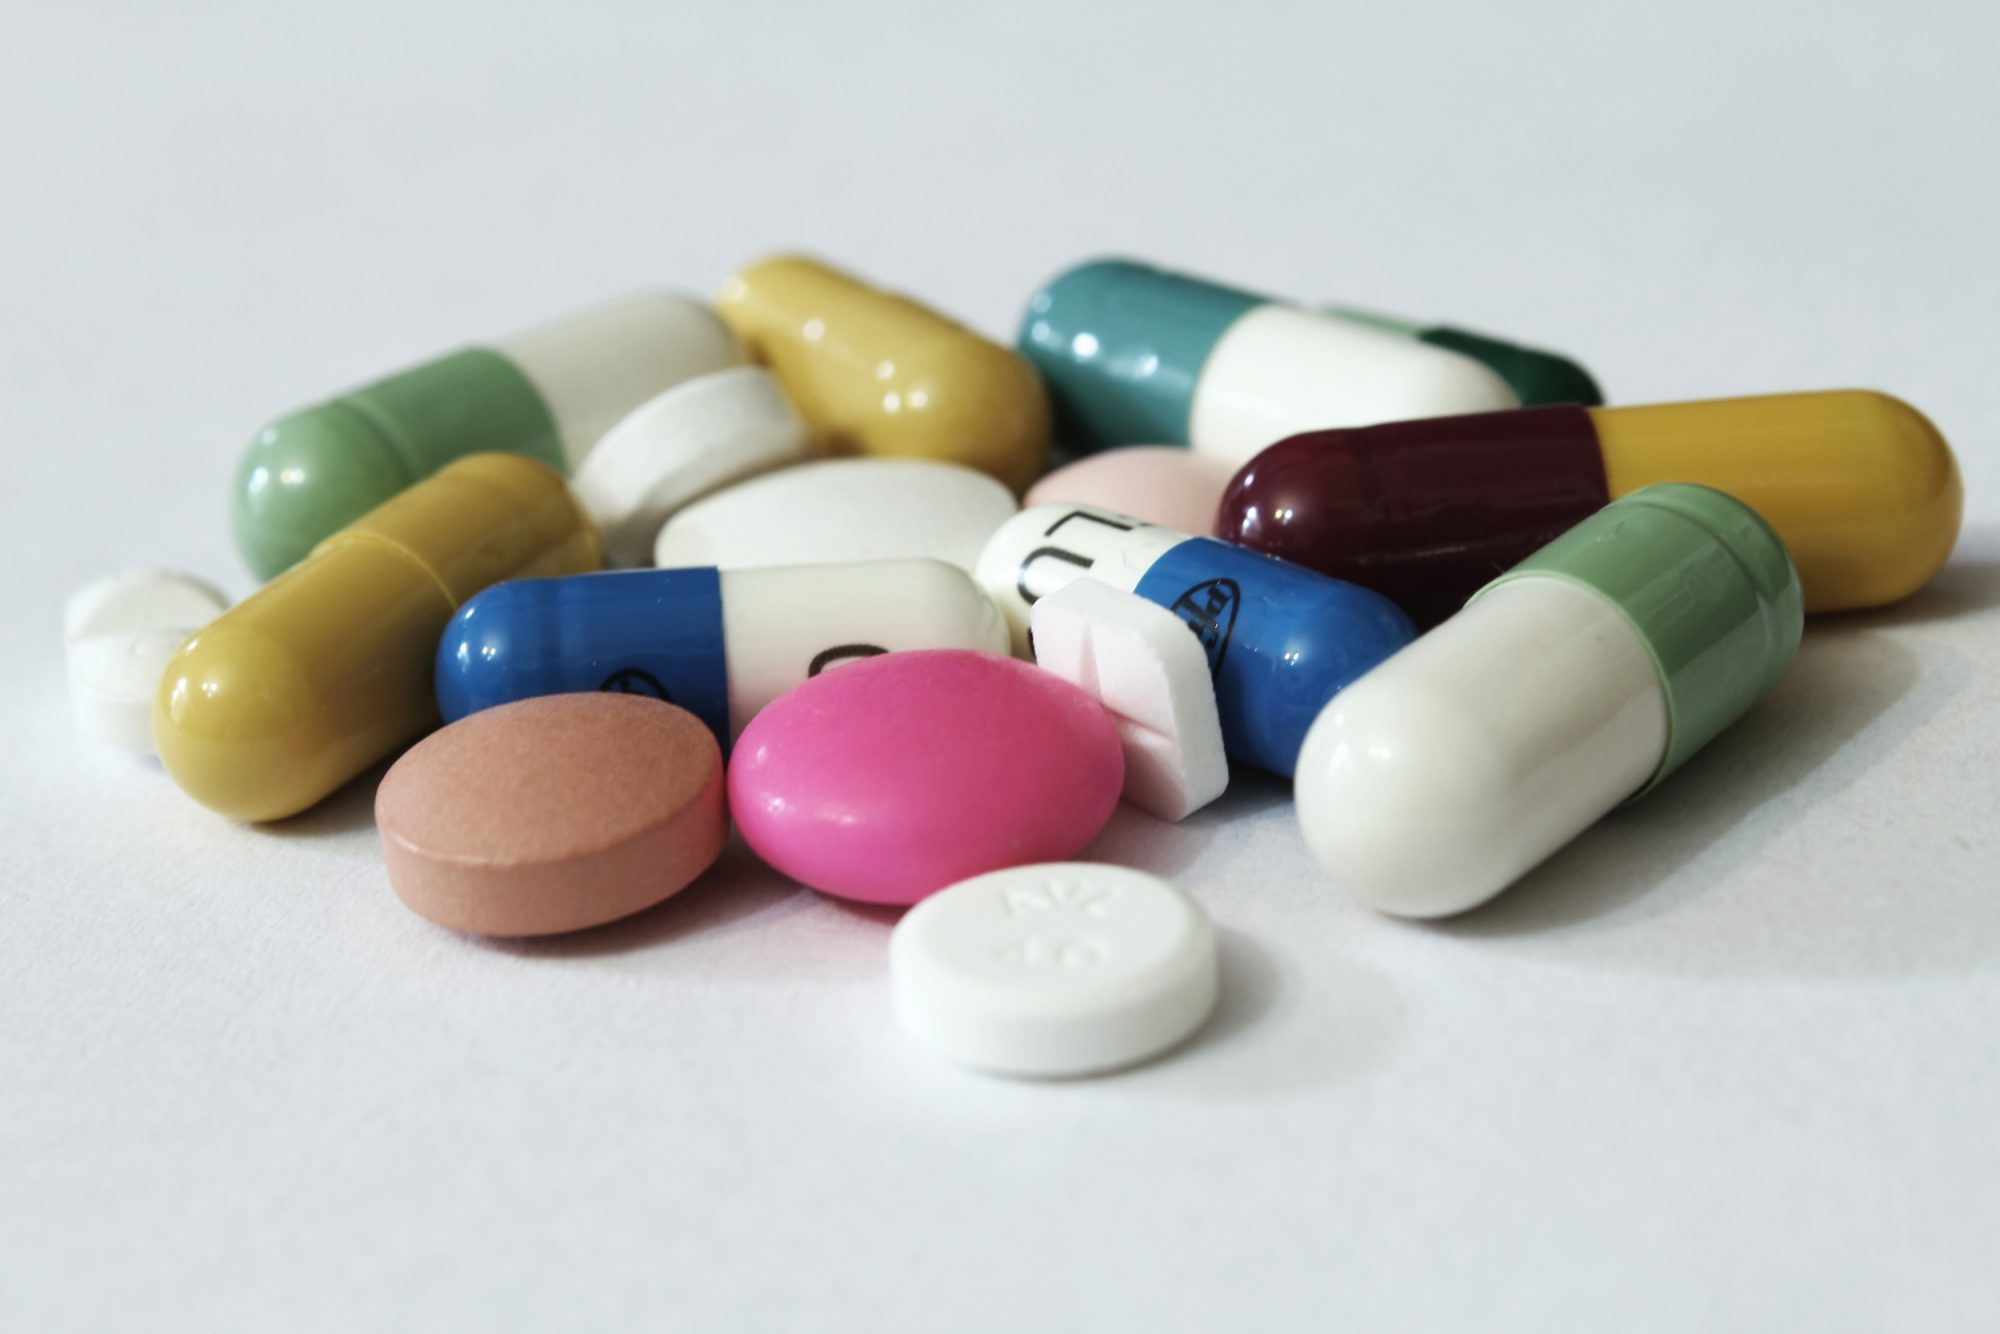 EC: When Medication Is Part of Your Balanced Breakfast